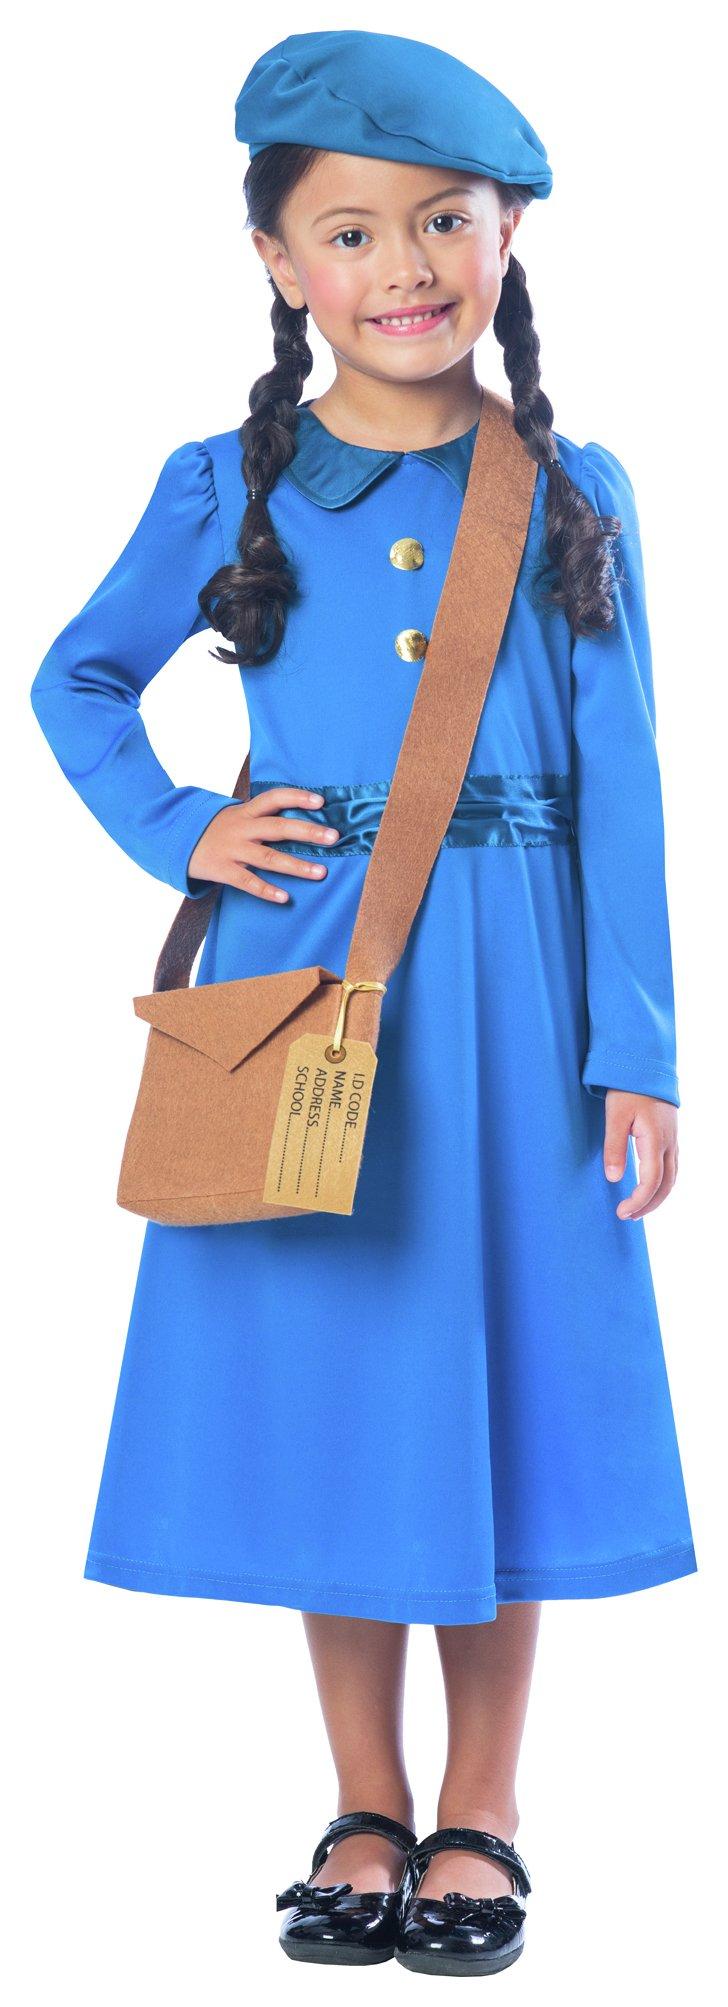 Image of Amscan Evacuee Girl Costume - 3 - 4 Years.